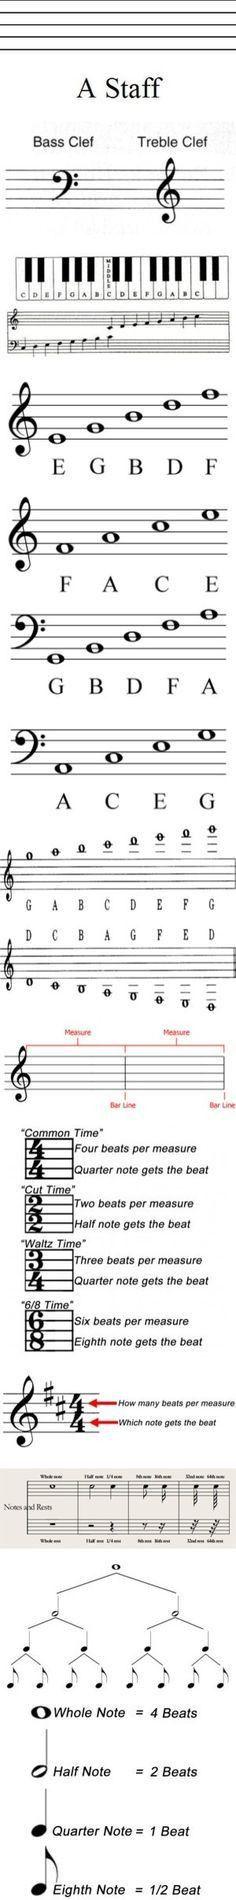 music paper | 806 x 1003 · 85 kB · gif, Blank Music Manuscript ...